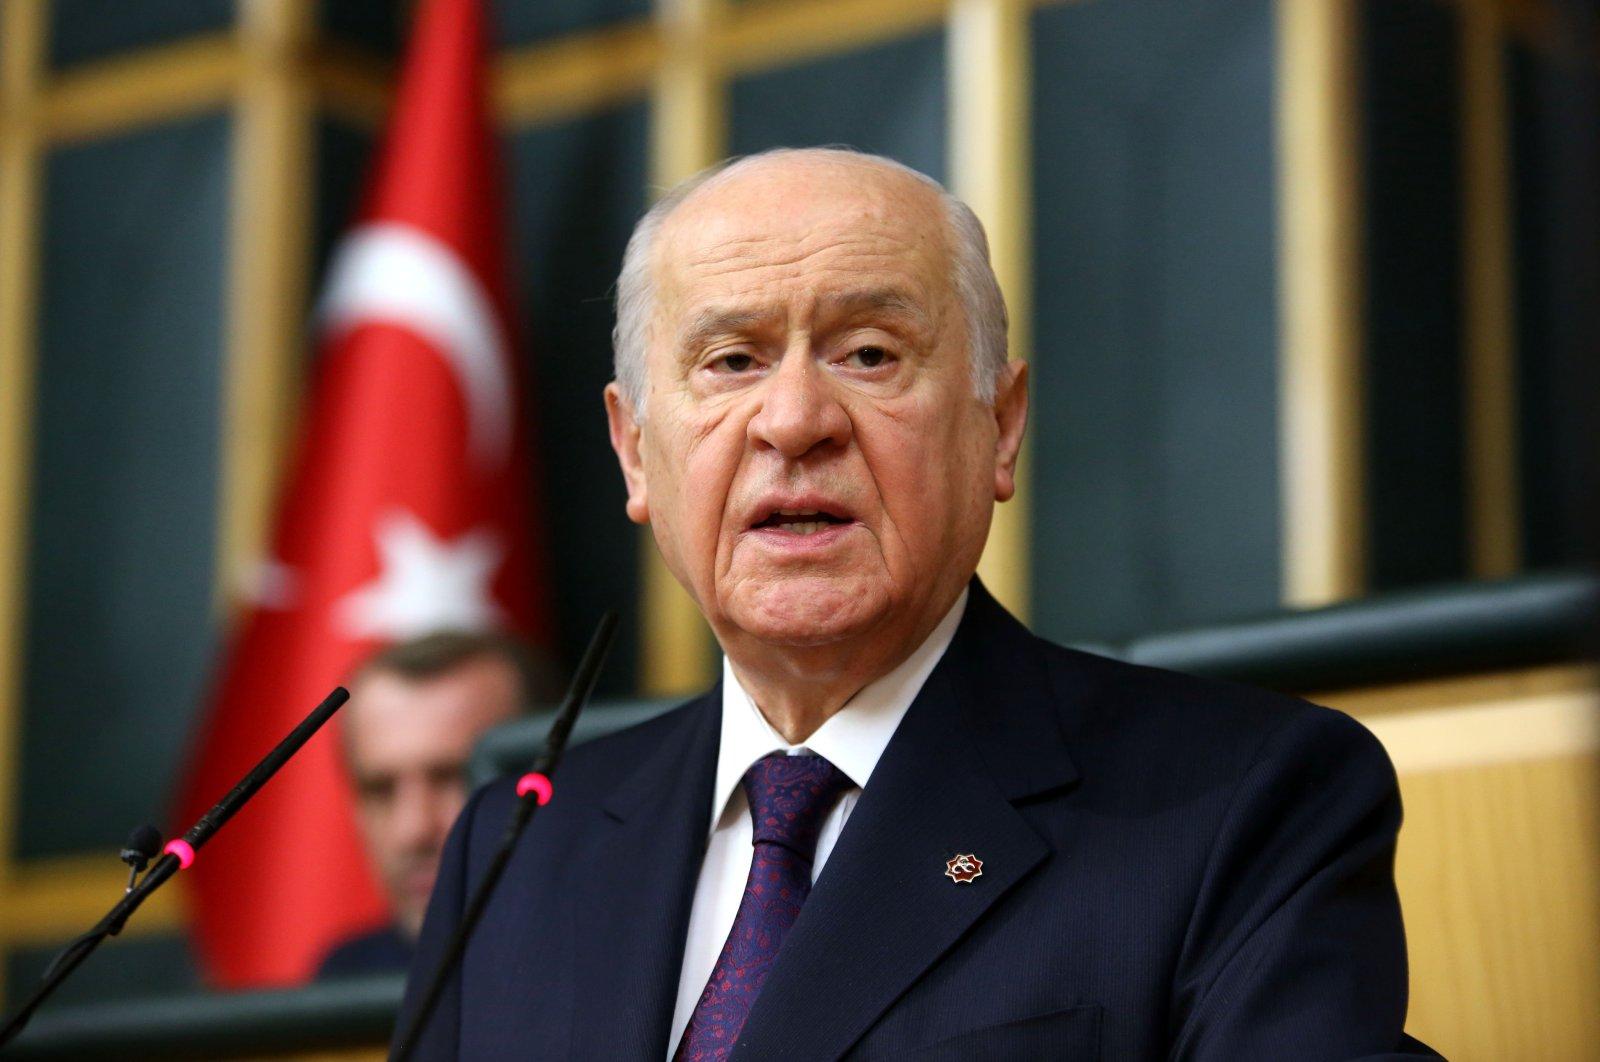 Nationalist Movement Party (MHP) leader Devlet Bahçeli speaks at his parliamentary group meeting in Ankara, Turkey, Dec. 6, 2018. (PHOTO BY ALI EKEYILMAZ)